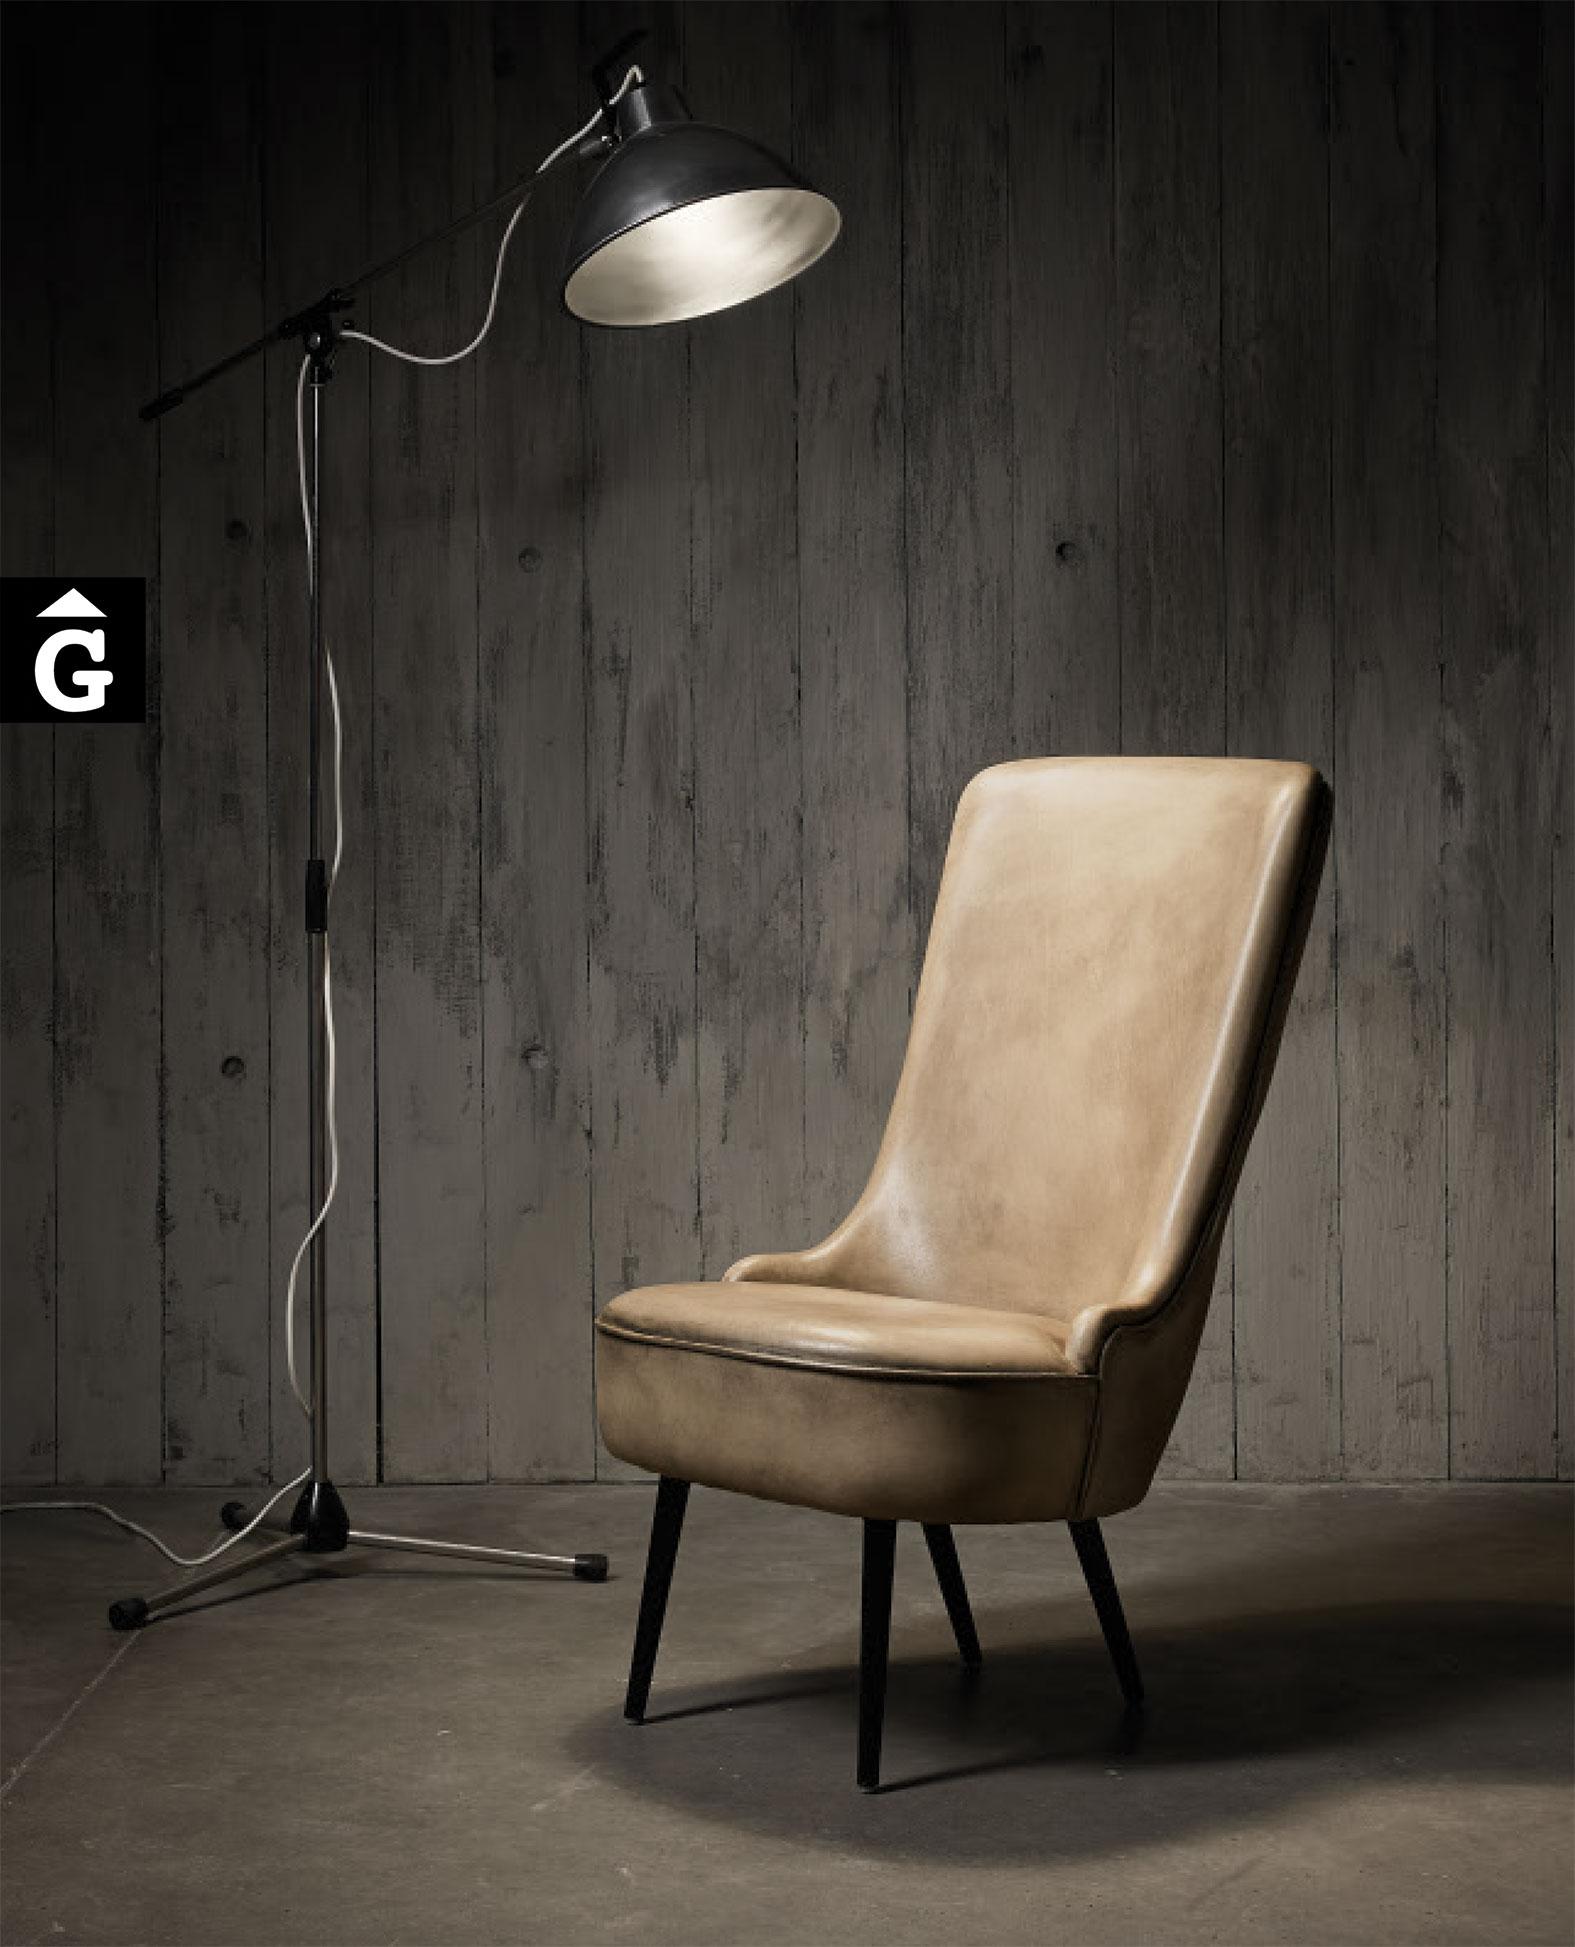 blower chair mobles gifreu il lusionem els amants de l 39 interiorisme i la decoraci. Black Bedroom Furniture Sets. Home Design Ideas